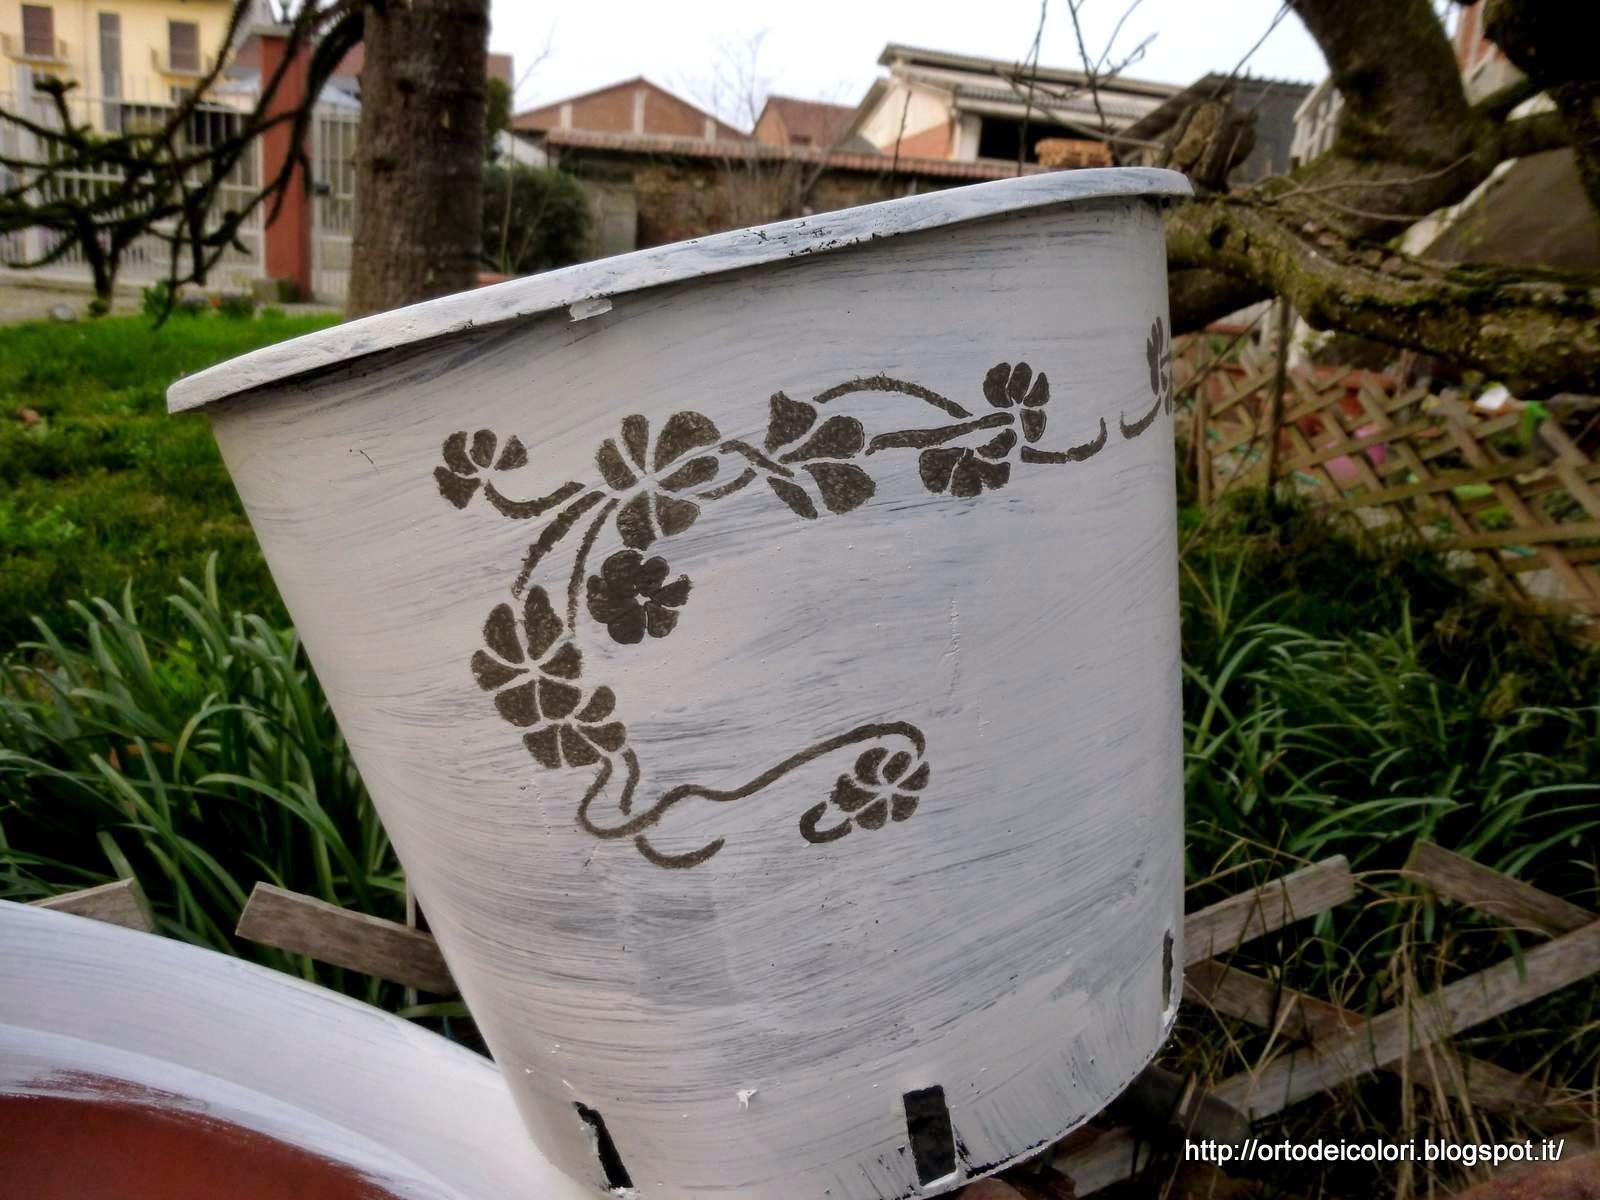 Vasi plastica decorati idea fai da te per riusare i vasi for Idea per giardino